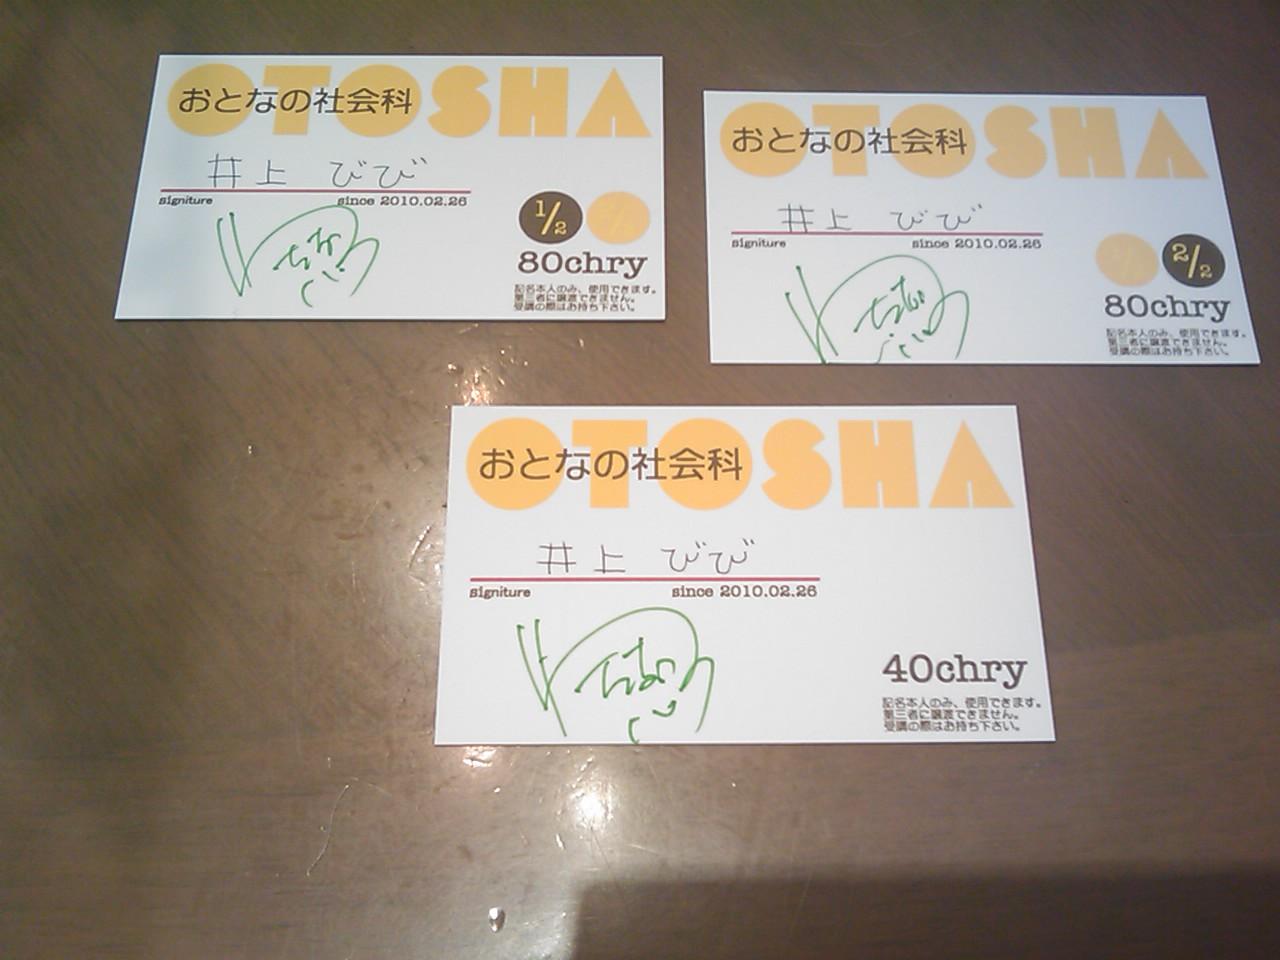 otoshaの会員カード